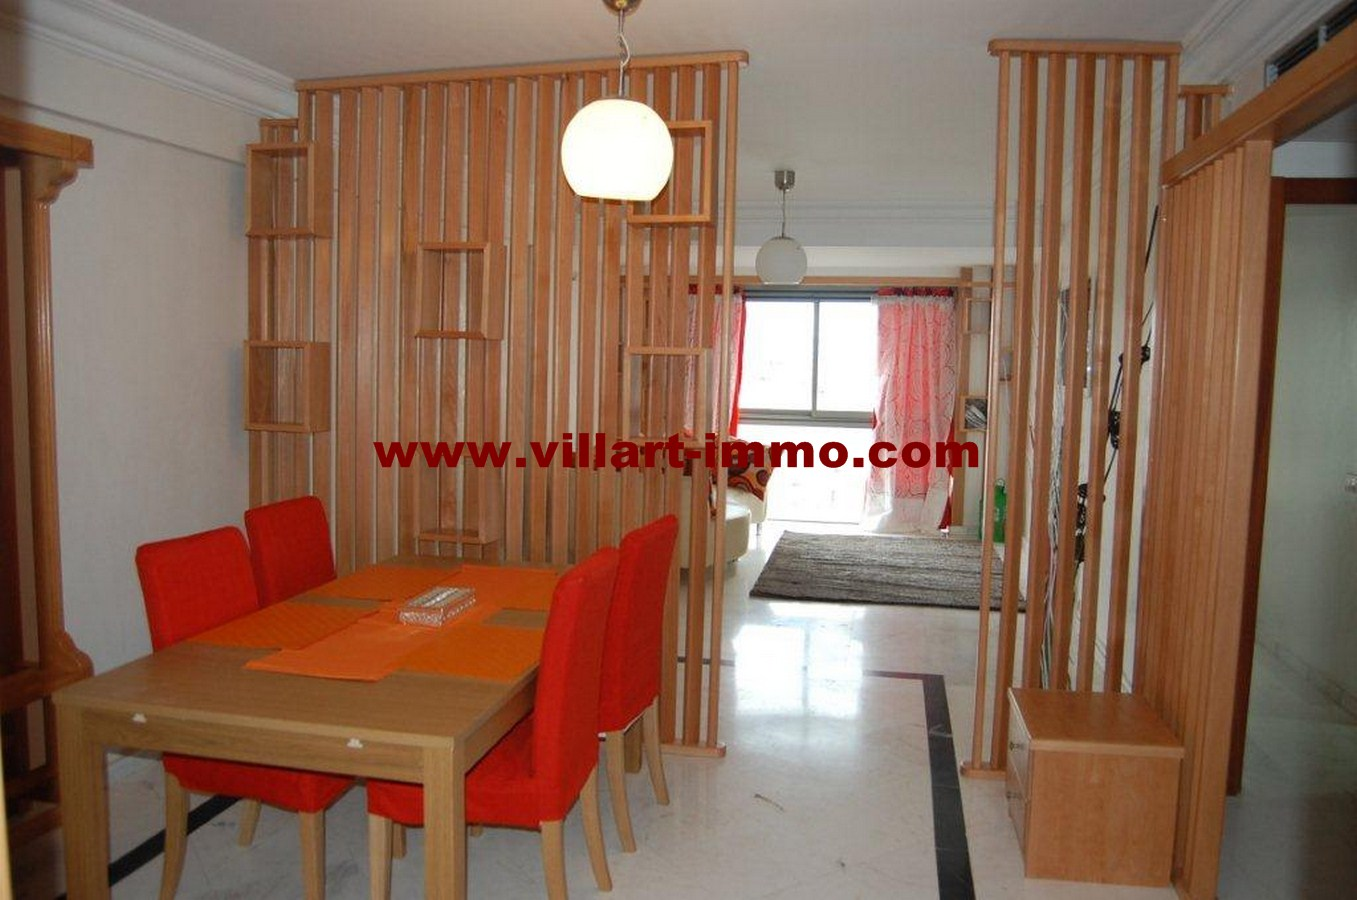 1-vente-appartement-tanger-centre-salon-1-va456-villart-immo